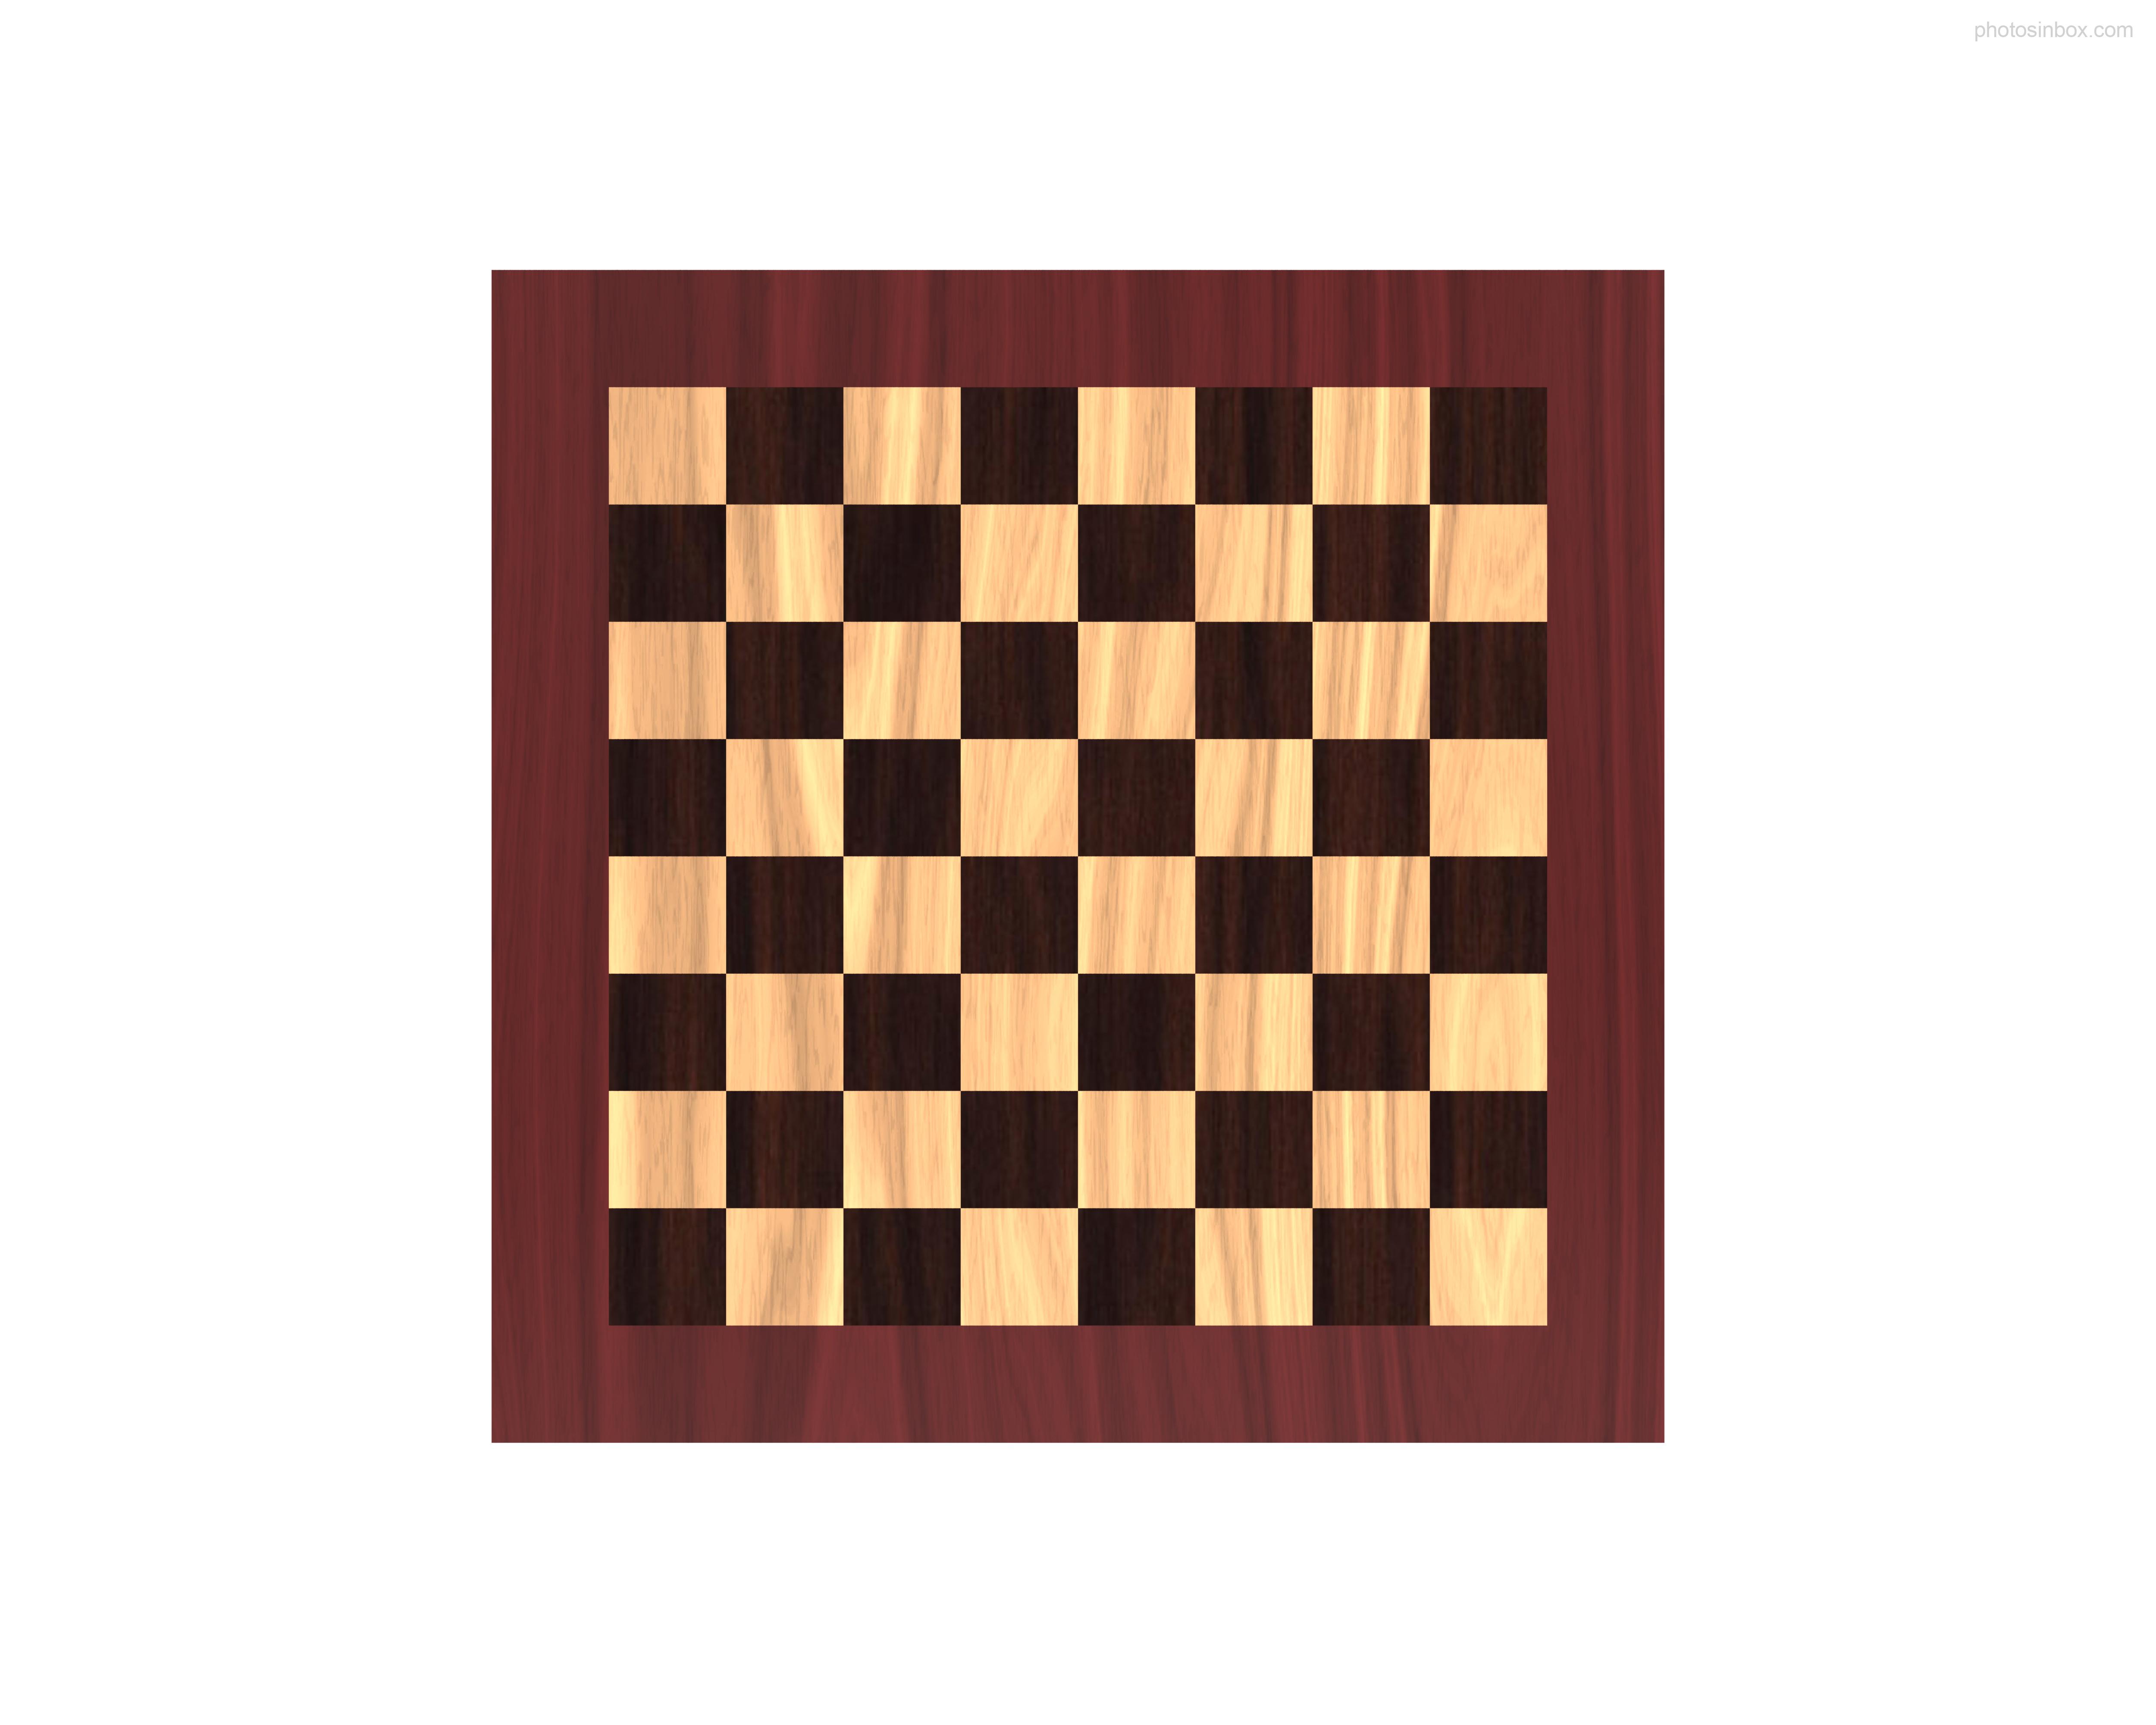 Chessboard Display Largejpg Clipart.